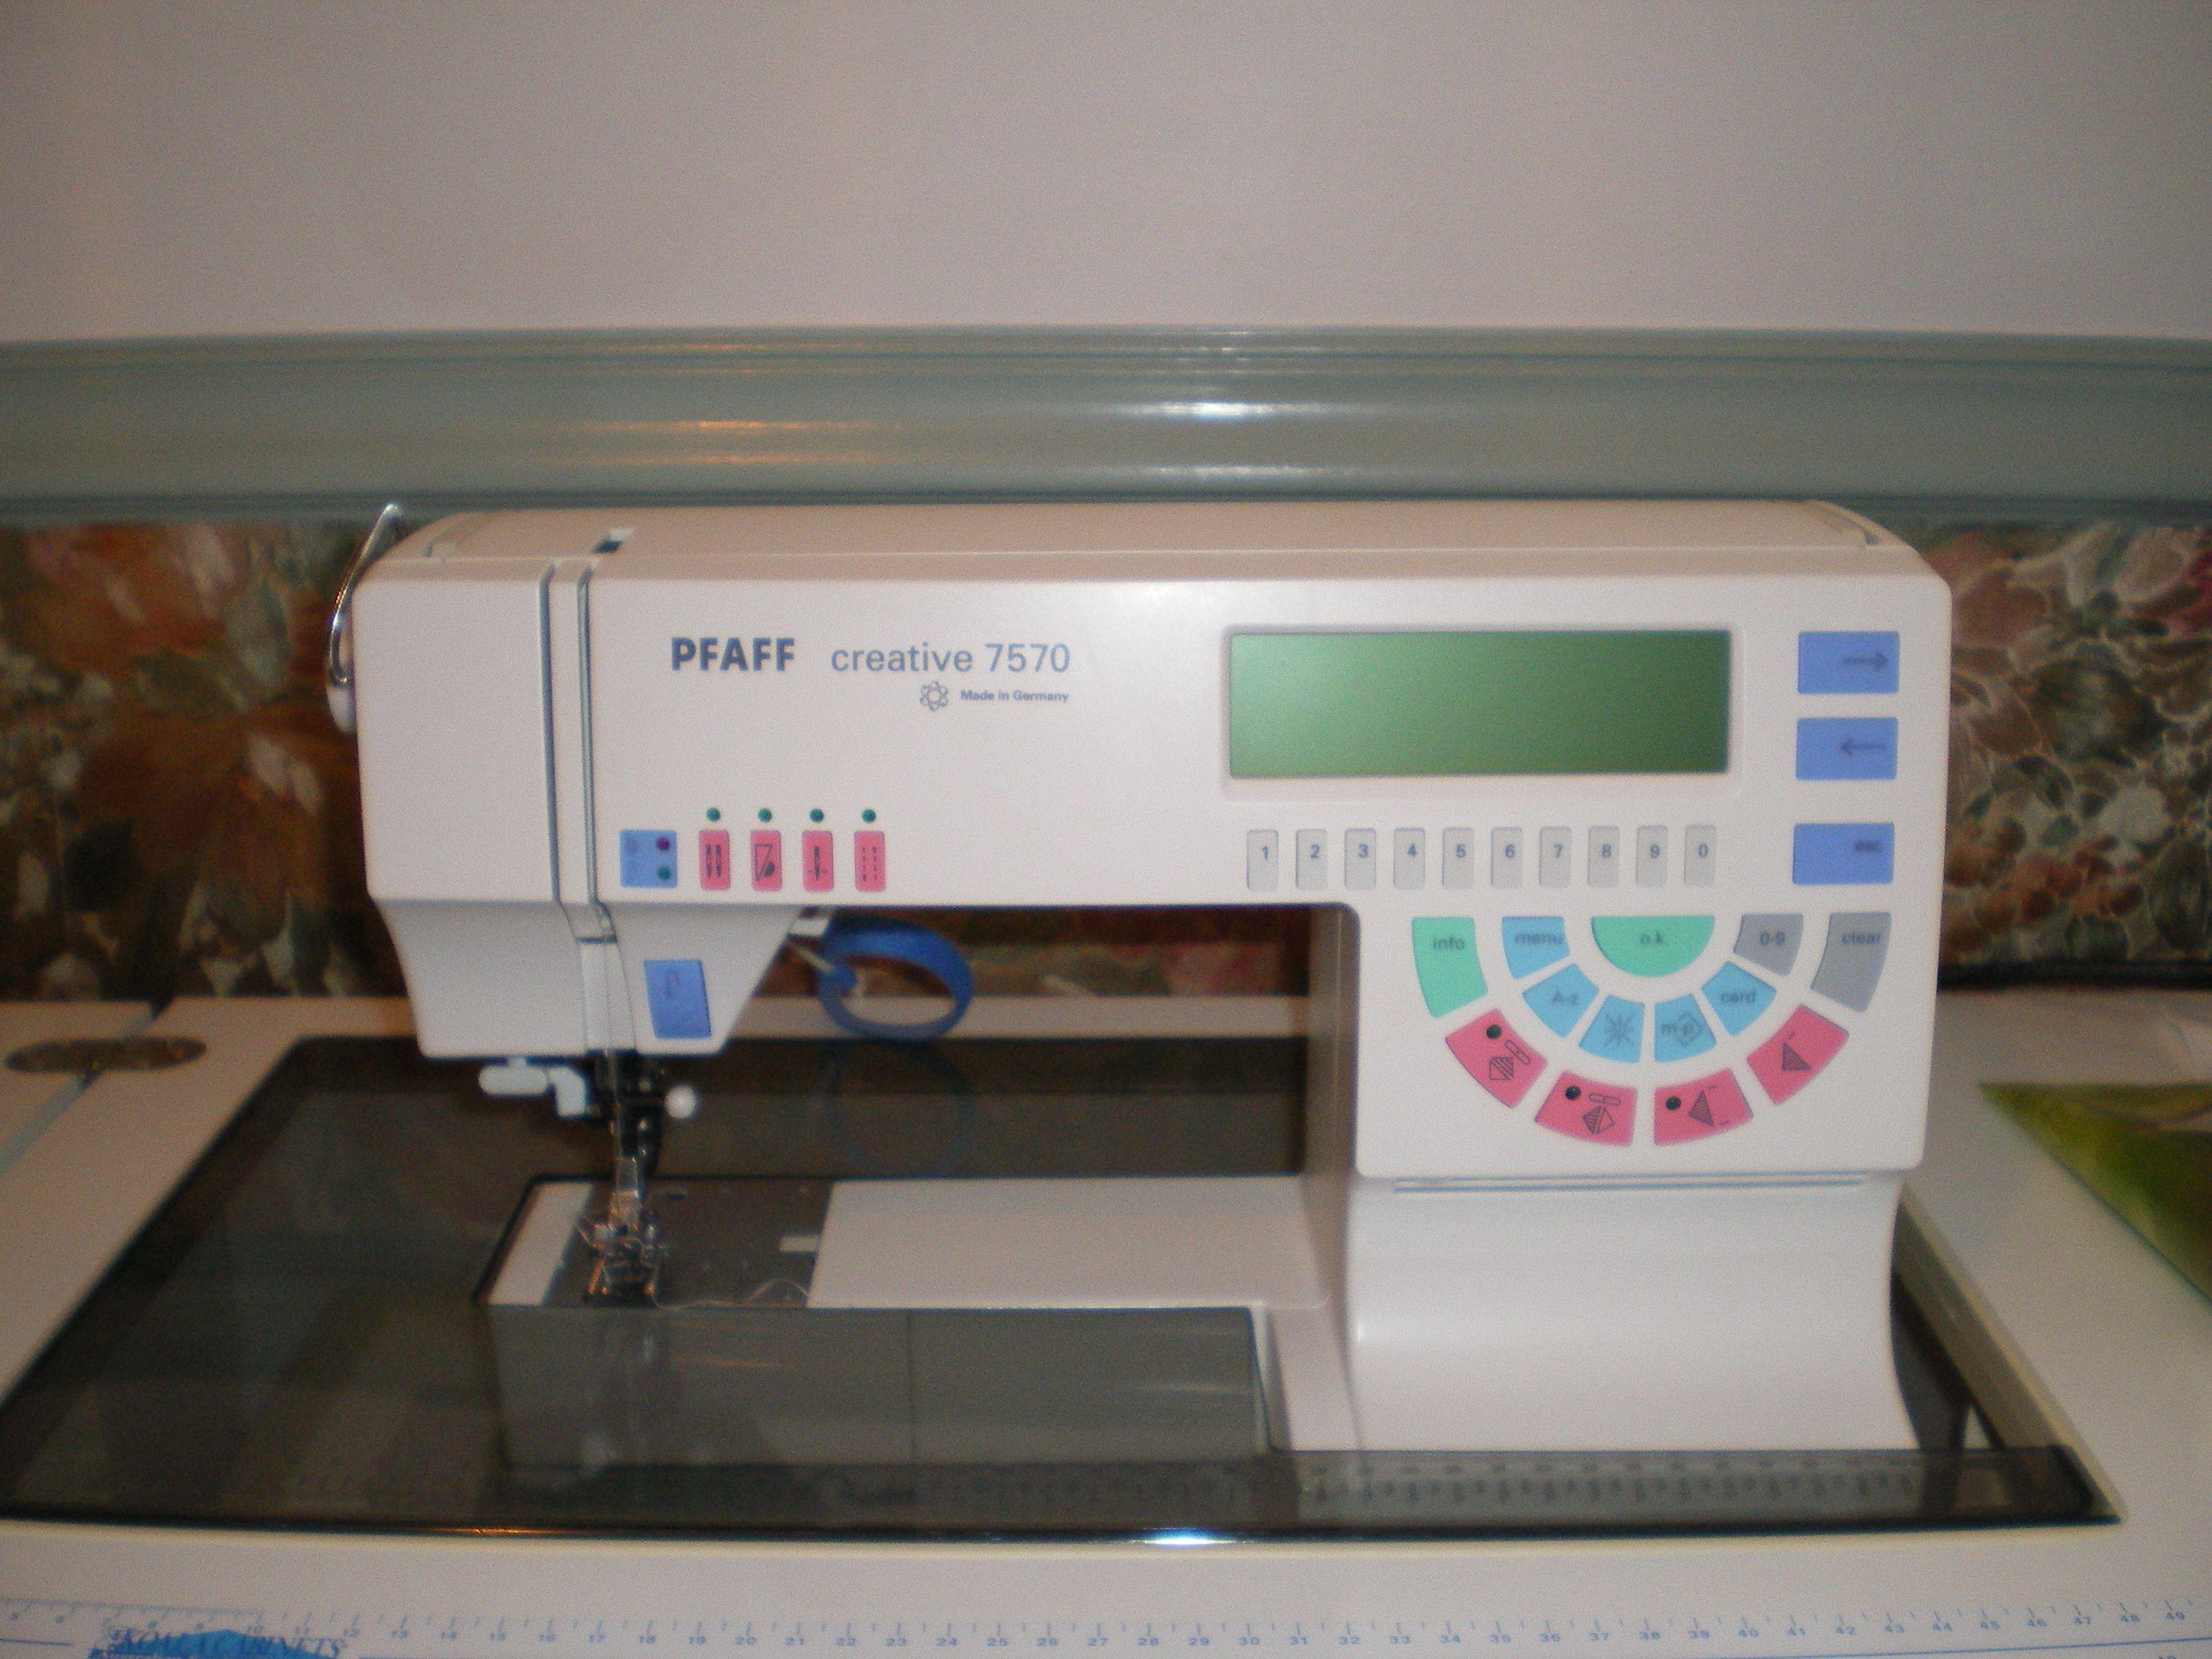 pfaff 7570 sewing machine